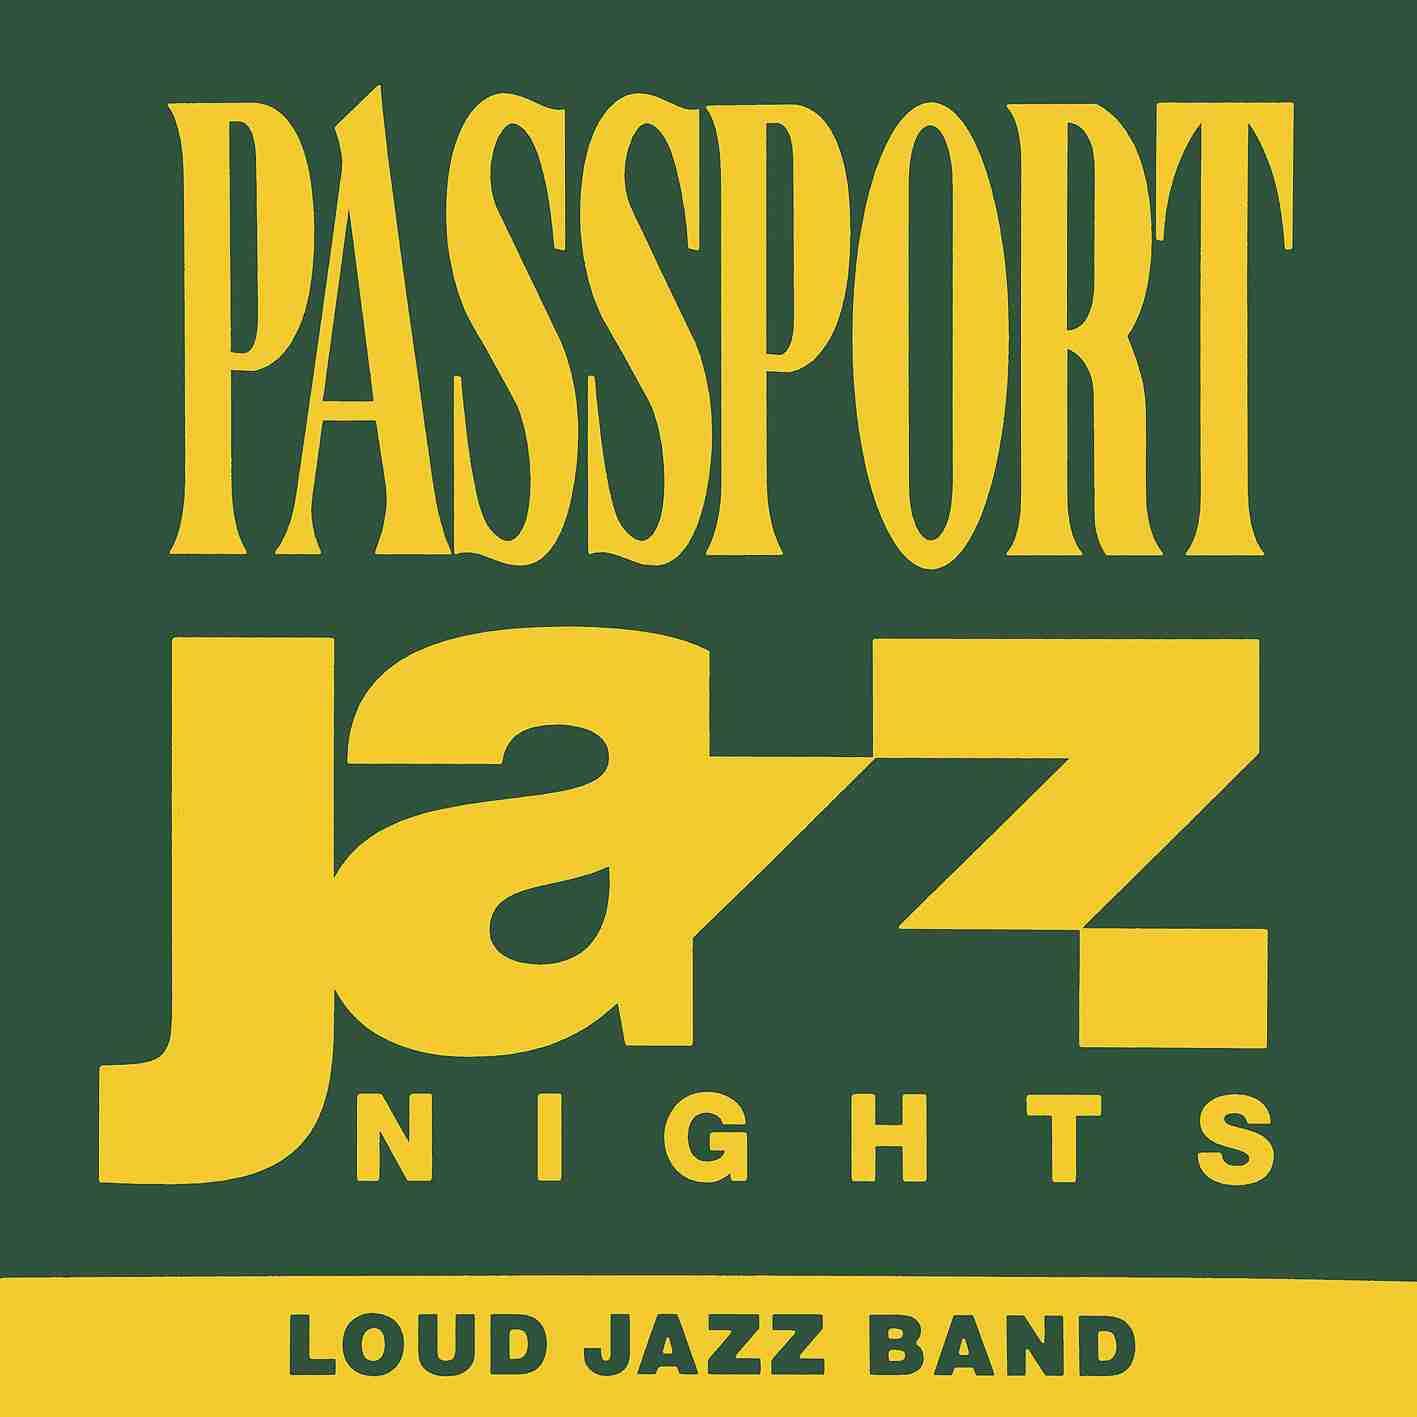 Passport Jazz Nights - Loud Jazz Band